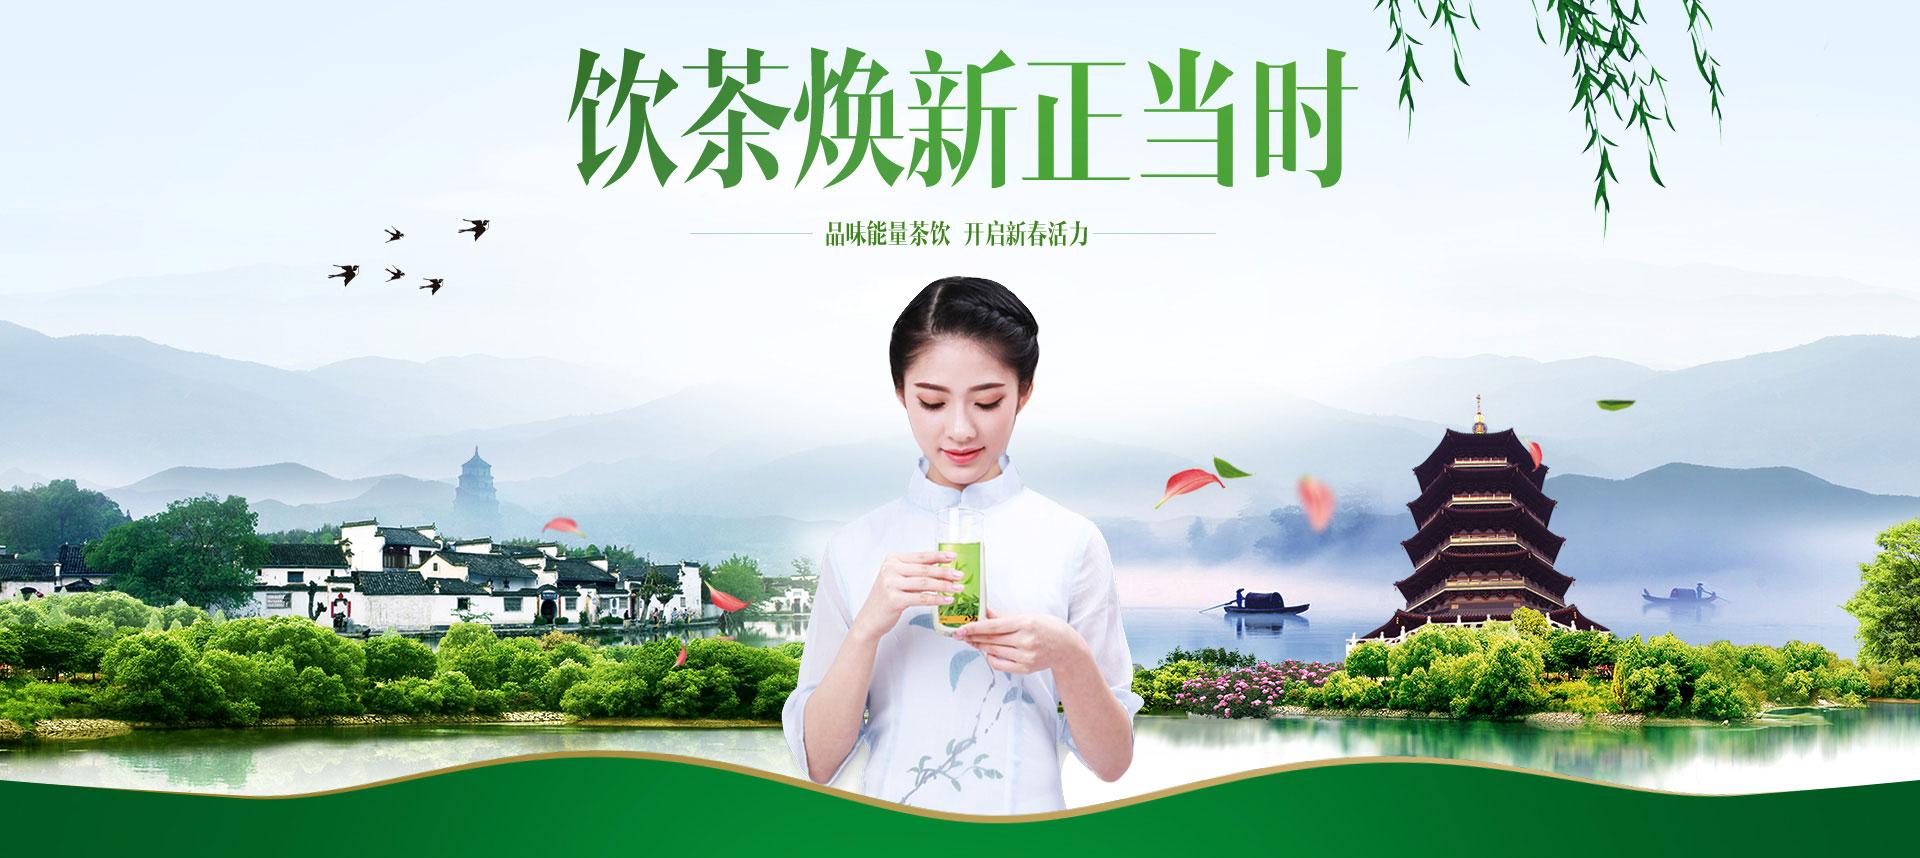 春茶2018_01